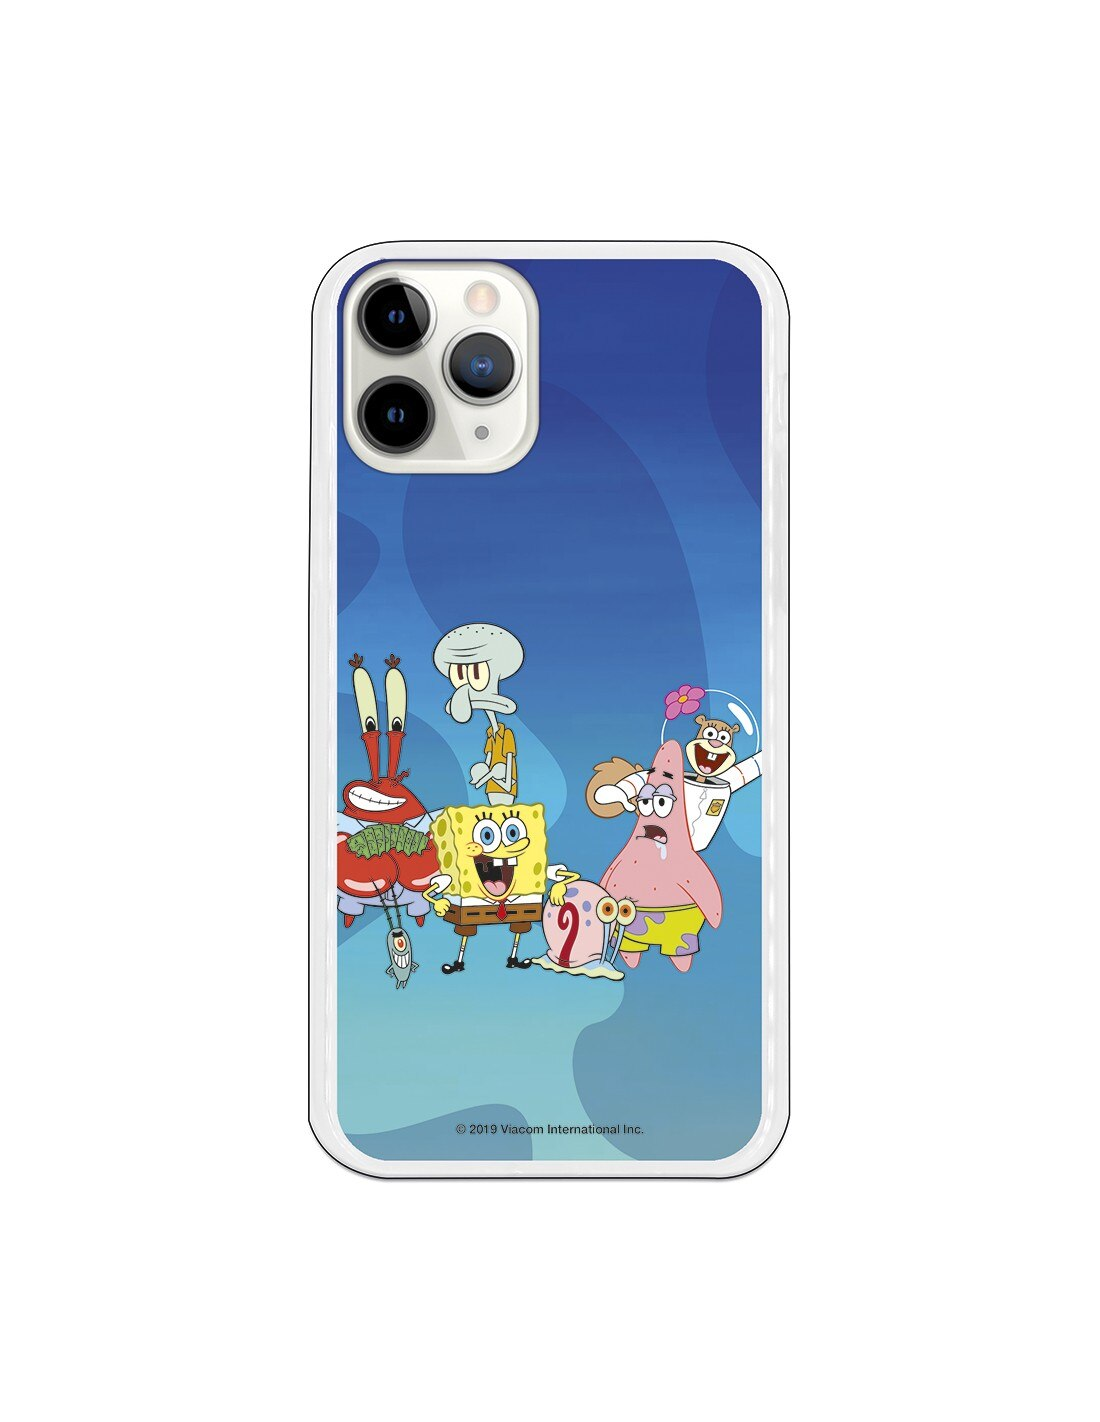 Capa para iphone 11 pro oficial nickelodeon personagens fundo marino-bob esponja